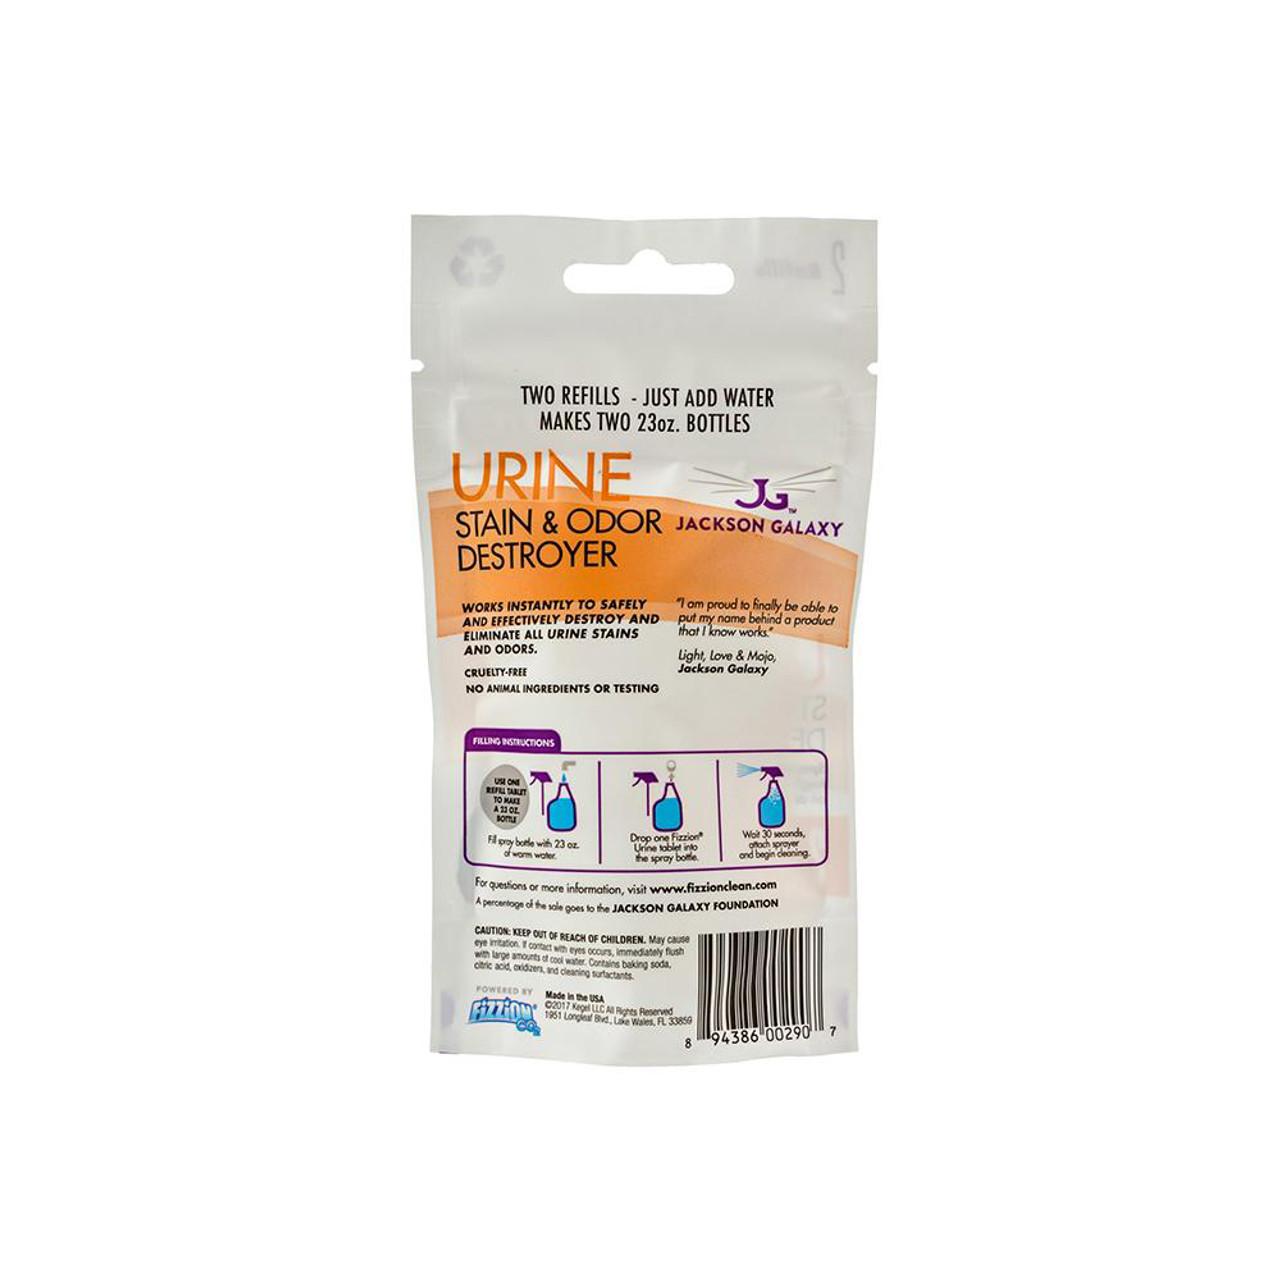 Jackson Galaxy Urine Stain & Odor Destroyer Refill Pack